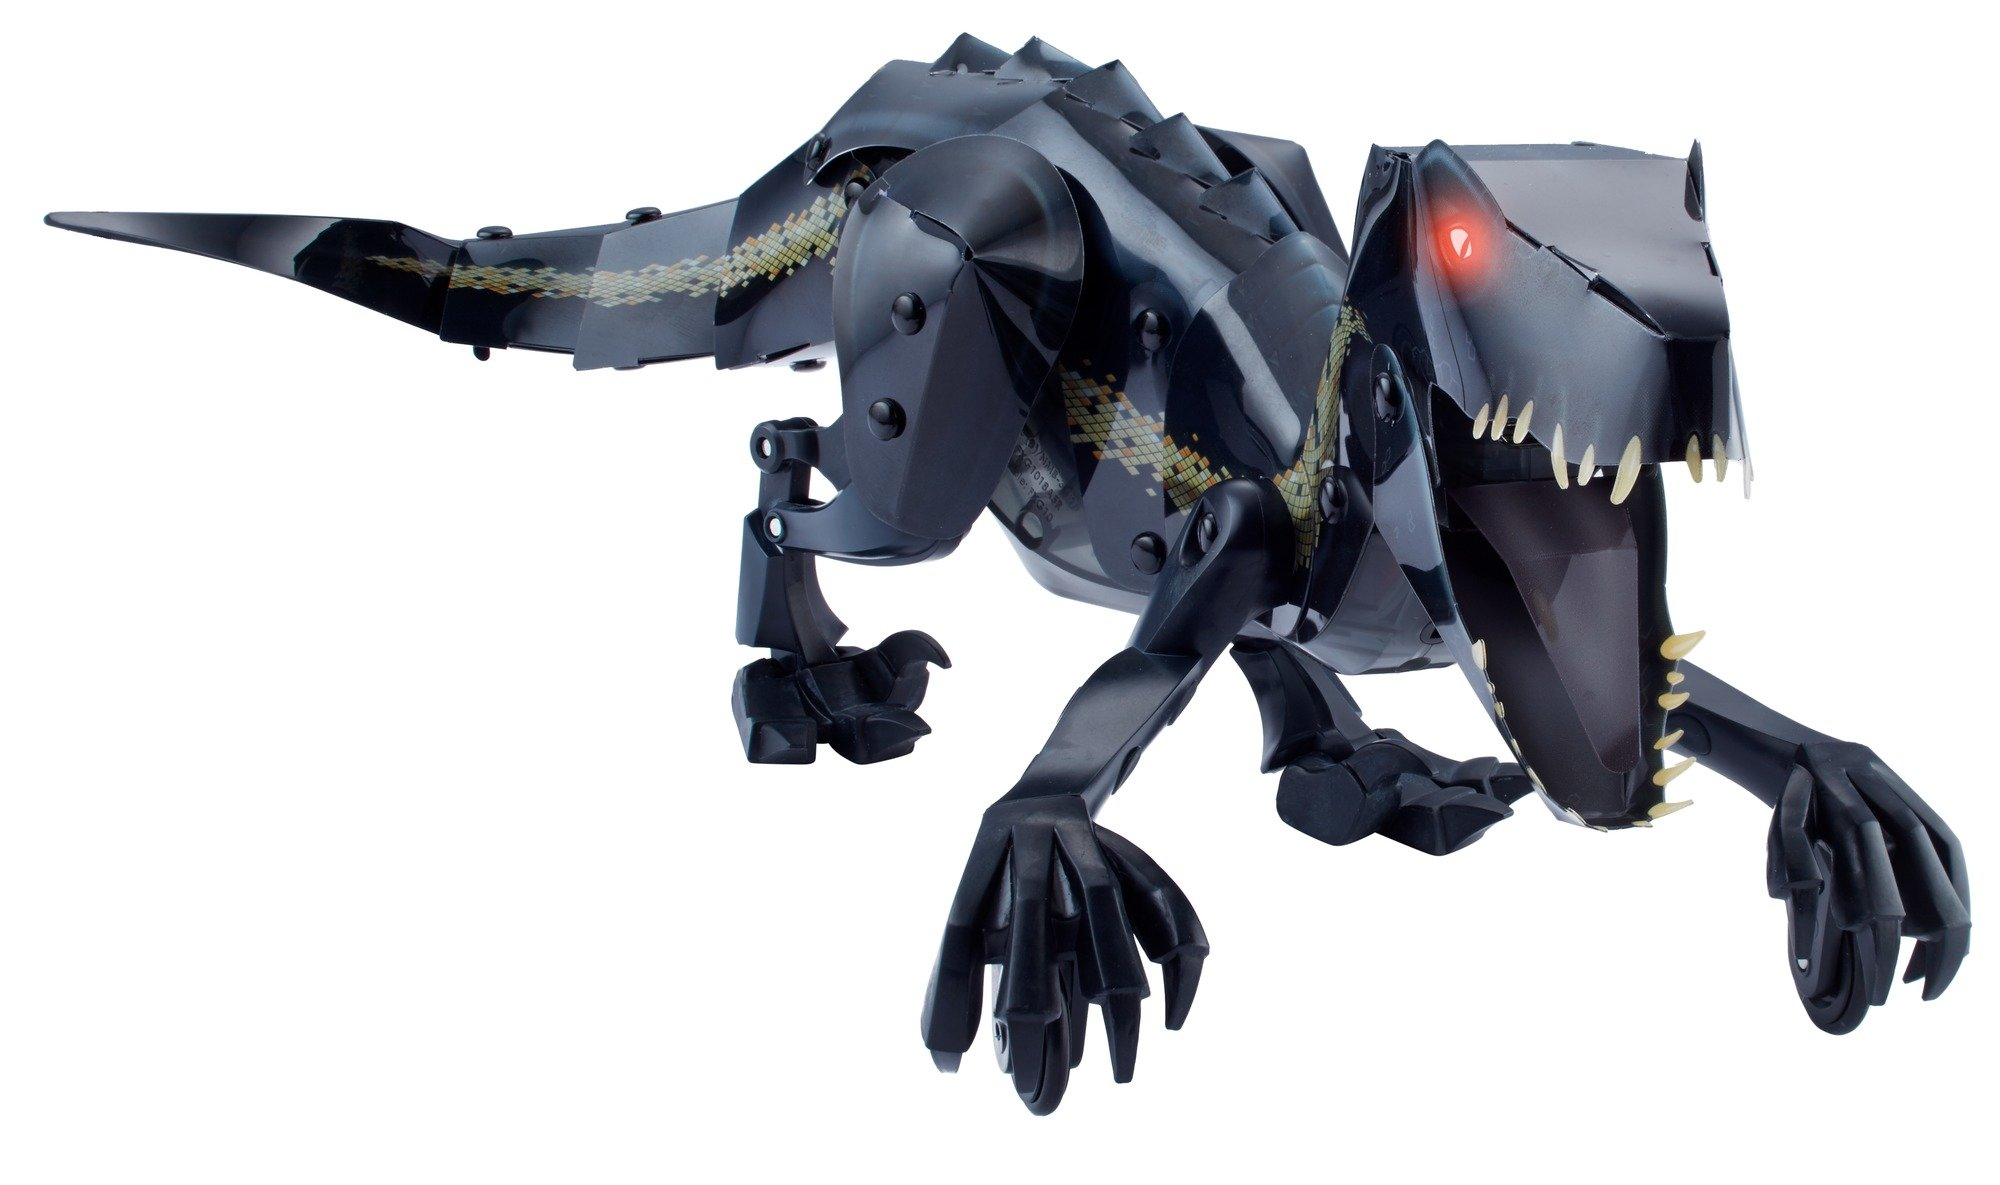 Kamigami Jurassic World Indoraptor Robot by Jurassic World Toys (Image #3)